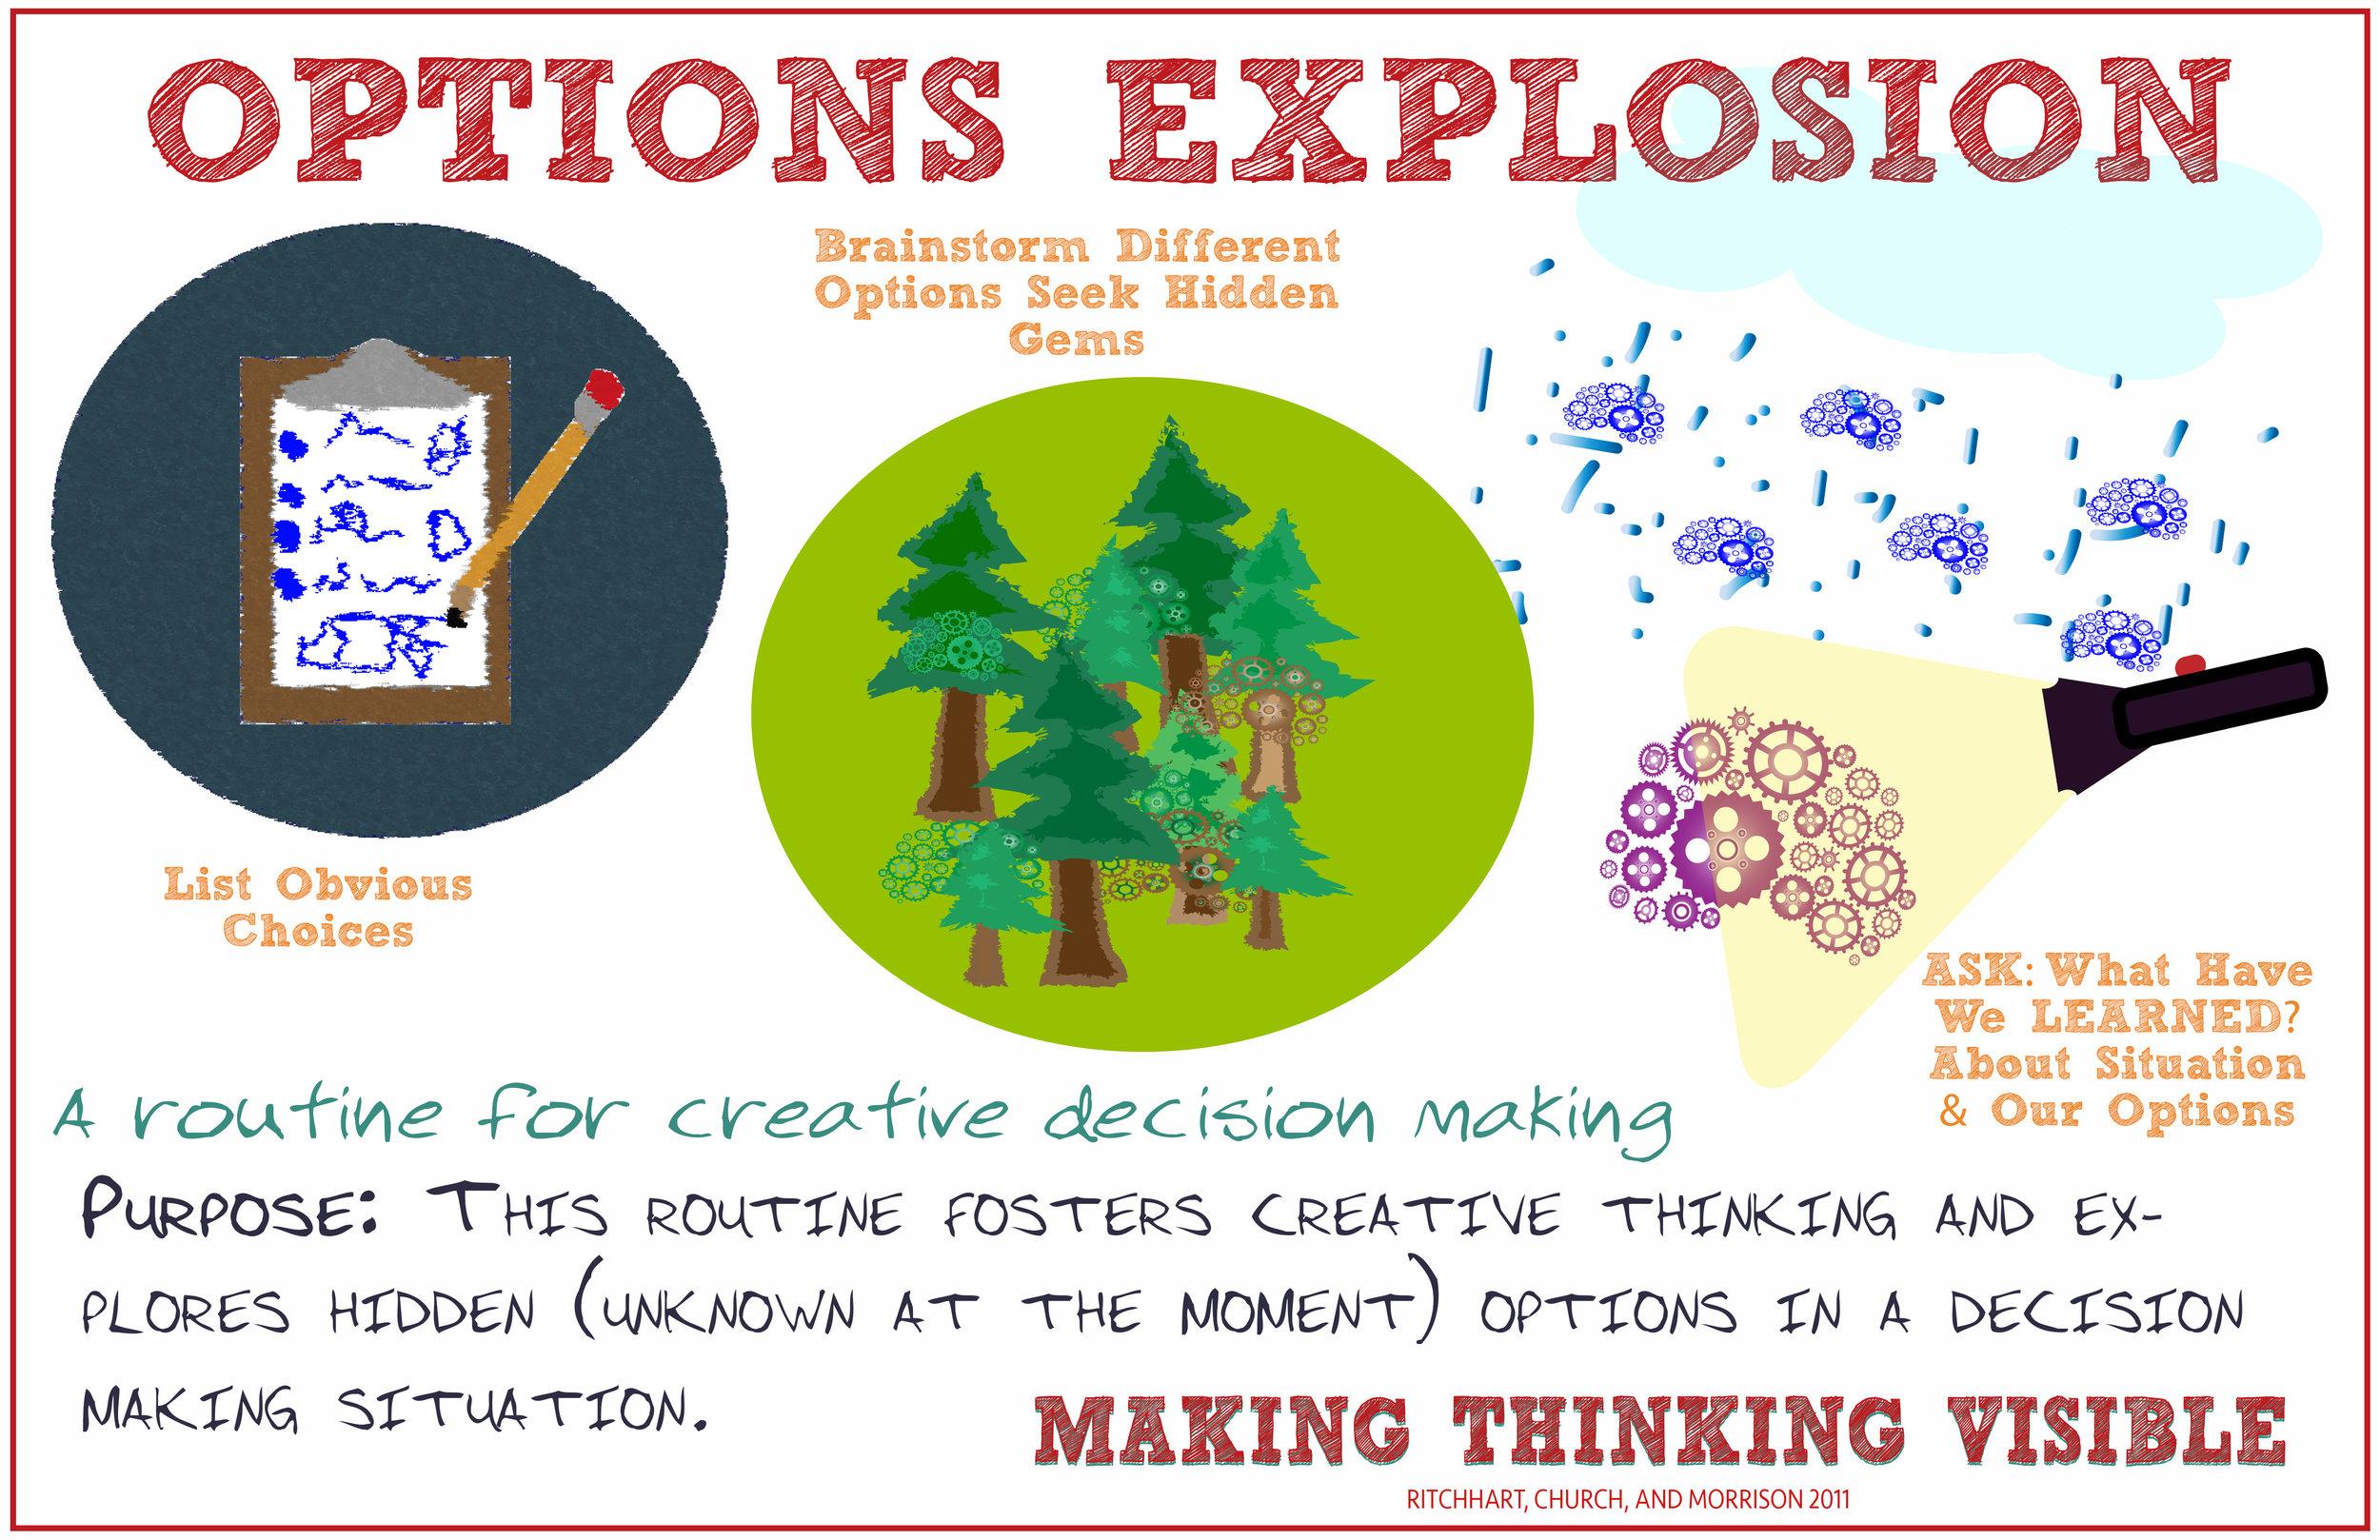 vtroptionsexplosions